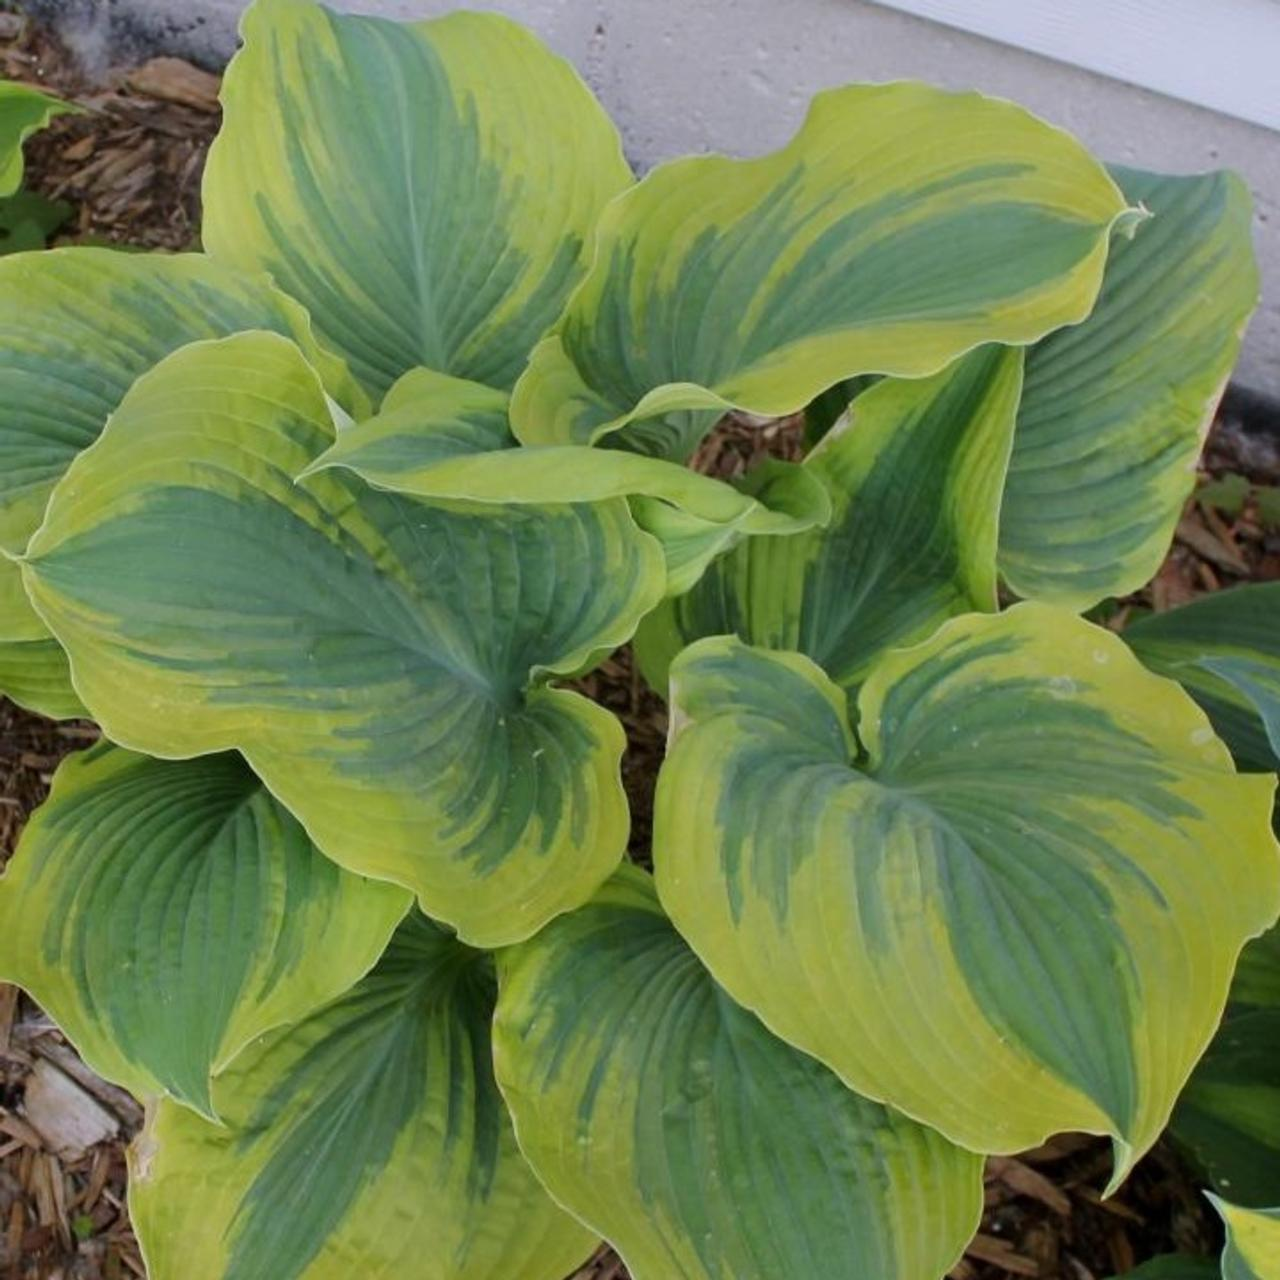 Hosta 'The King' plant